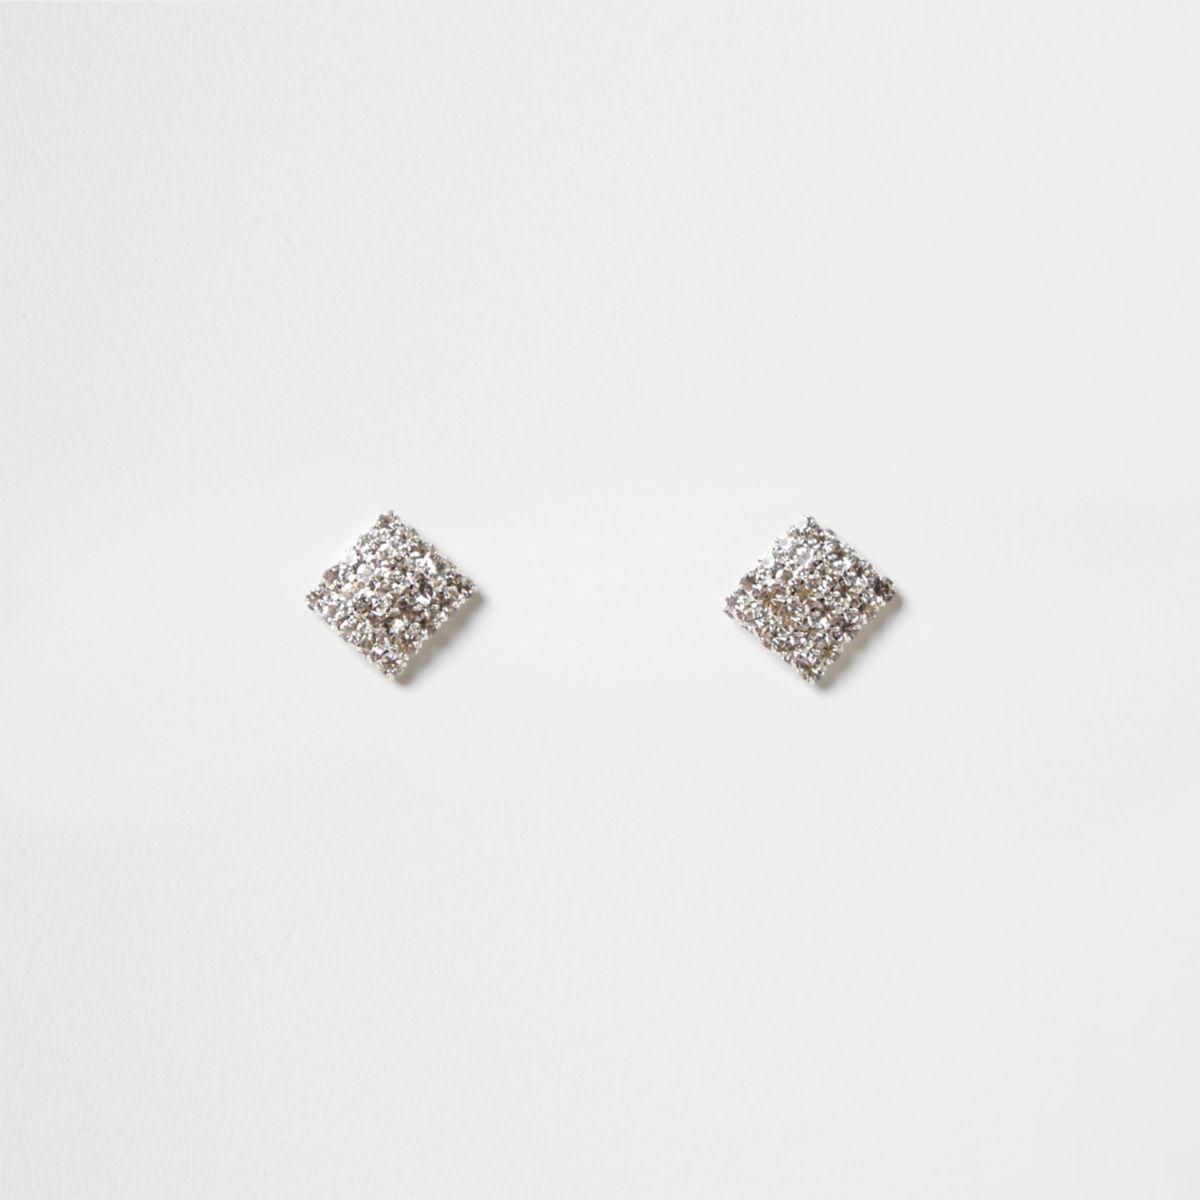 Silver tone rhinestone square stud earrings